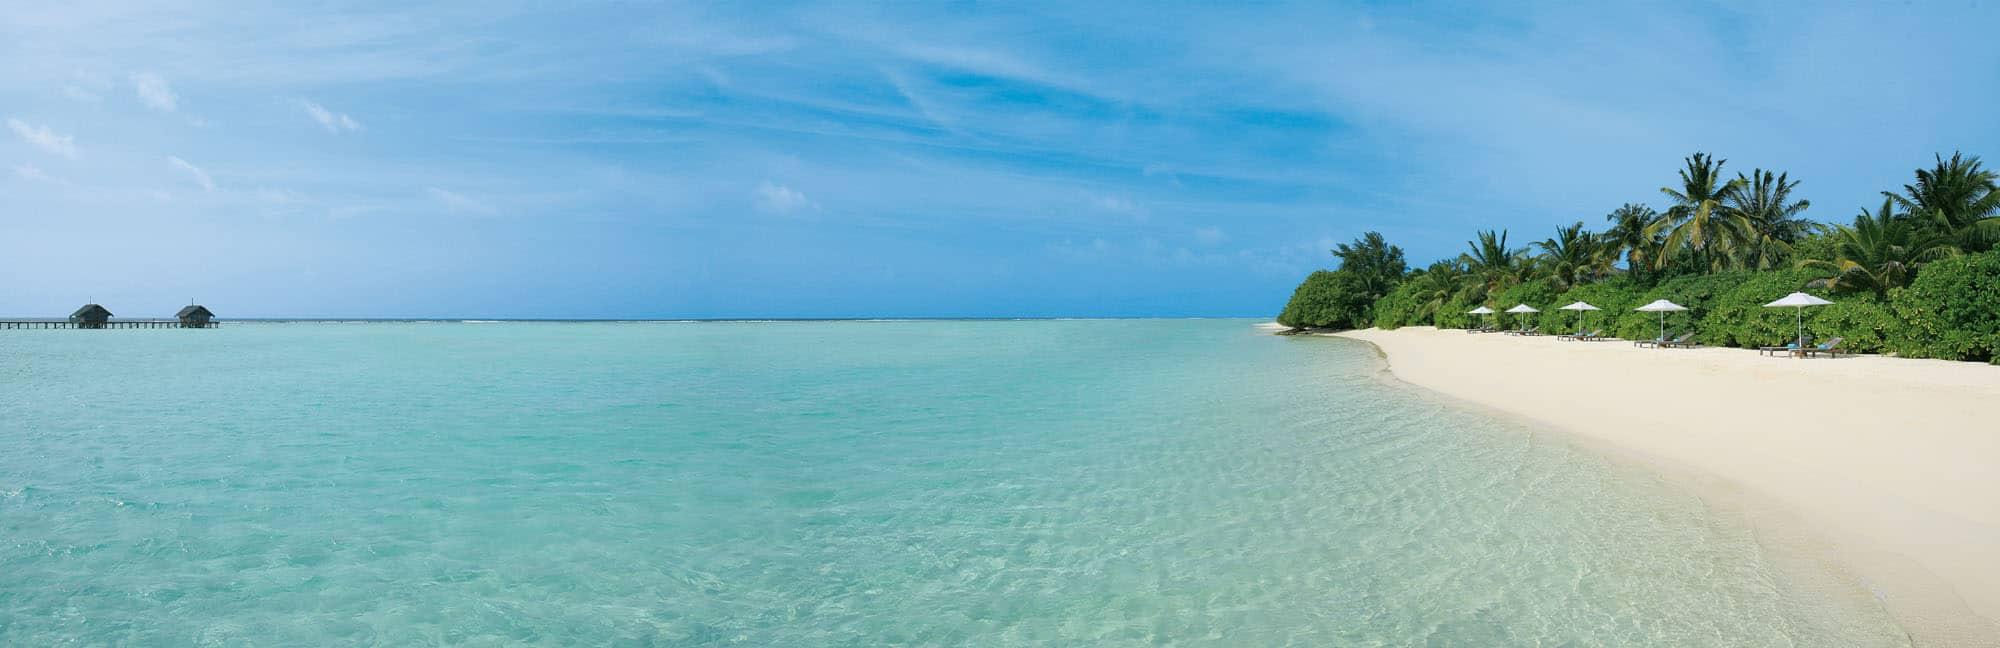 5 Star LUX* Maldives Resort (3)